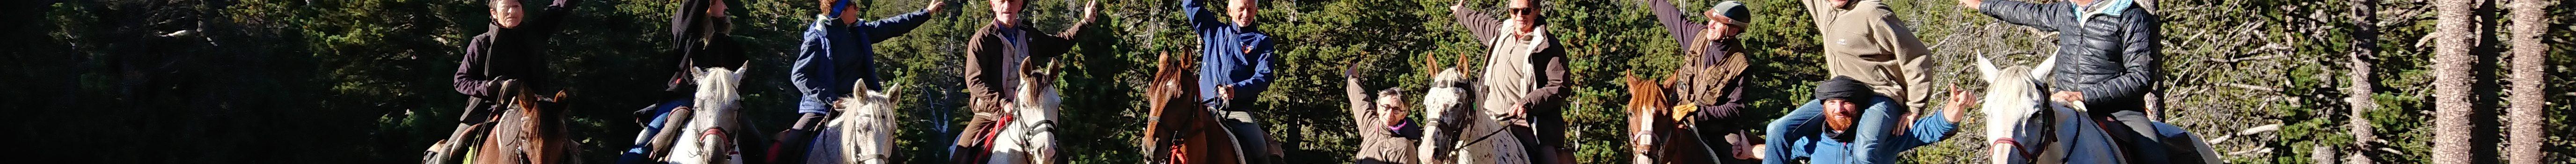 rando cheval canigou pyrenees